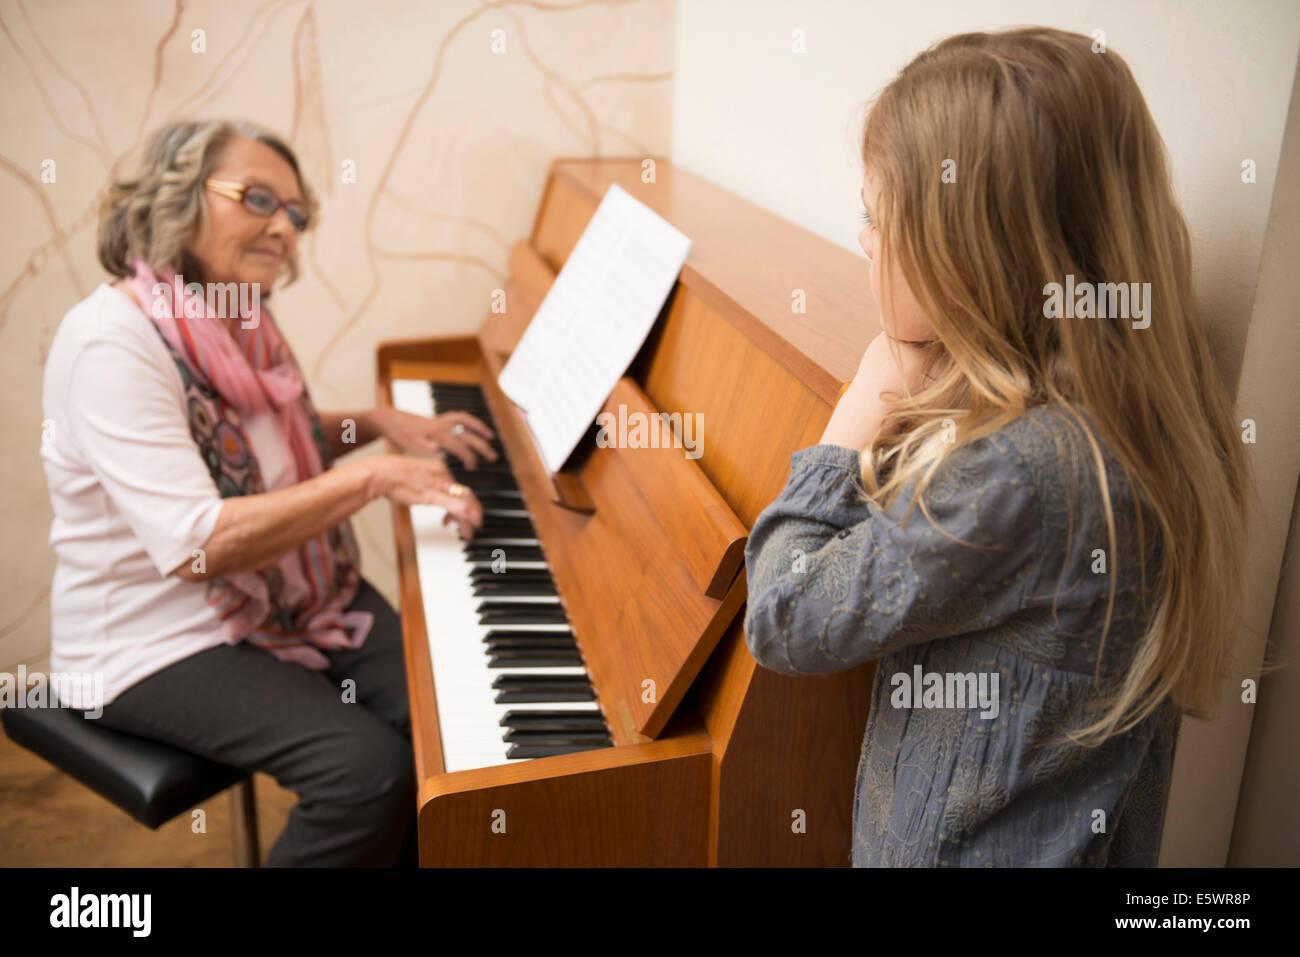 Granddaughter watching grandmother playing piano - Stock Image